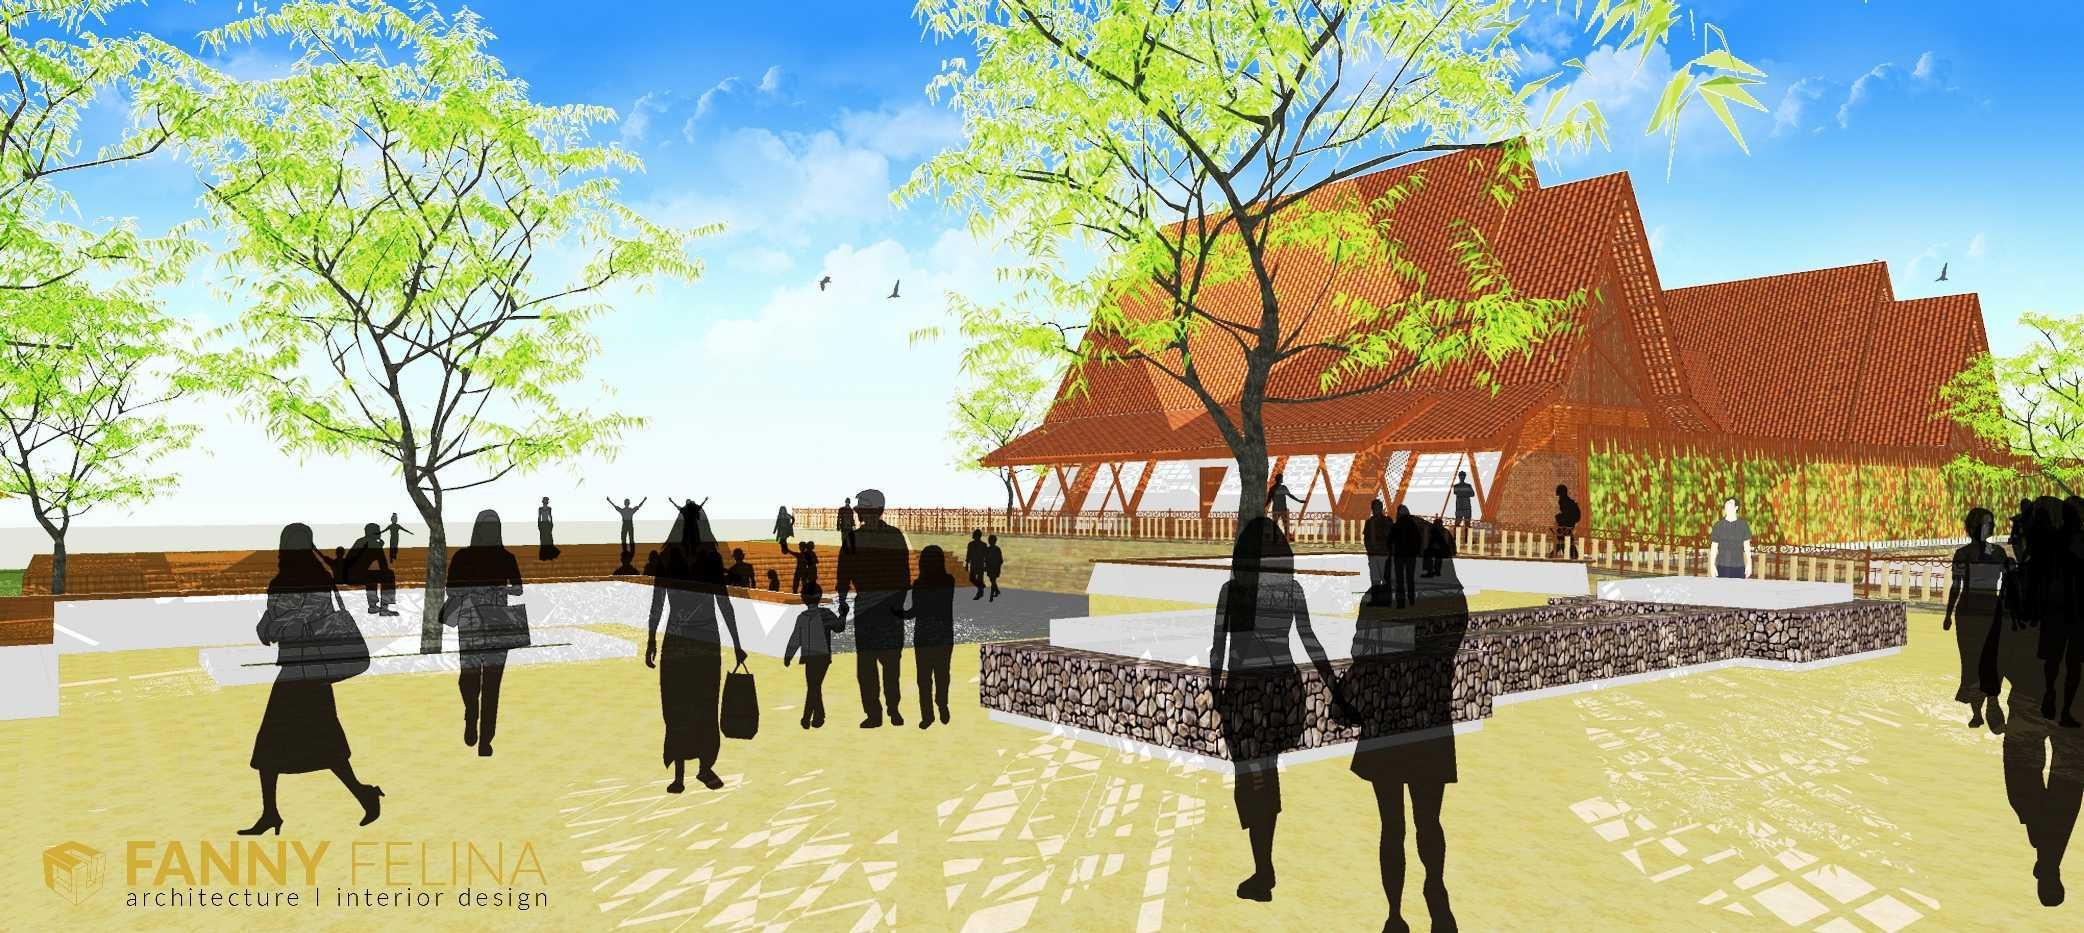 Fanny Felina Architecture & Interior Design Grha Batik Gedhog Di Desa Kedungrejo Kabupaten Tuban, Jawa Timur, Indonesia  11 Traditional,tradisional,wood  37753